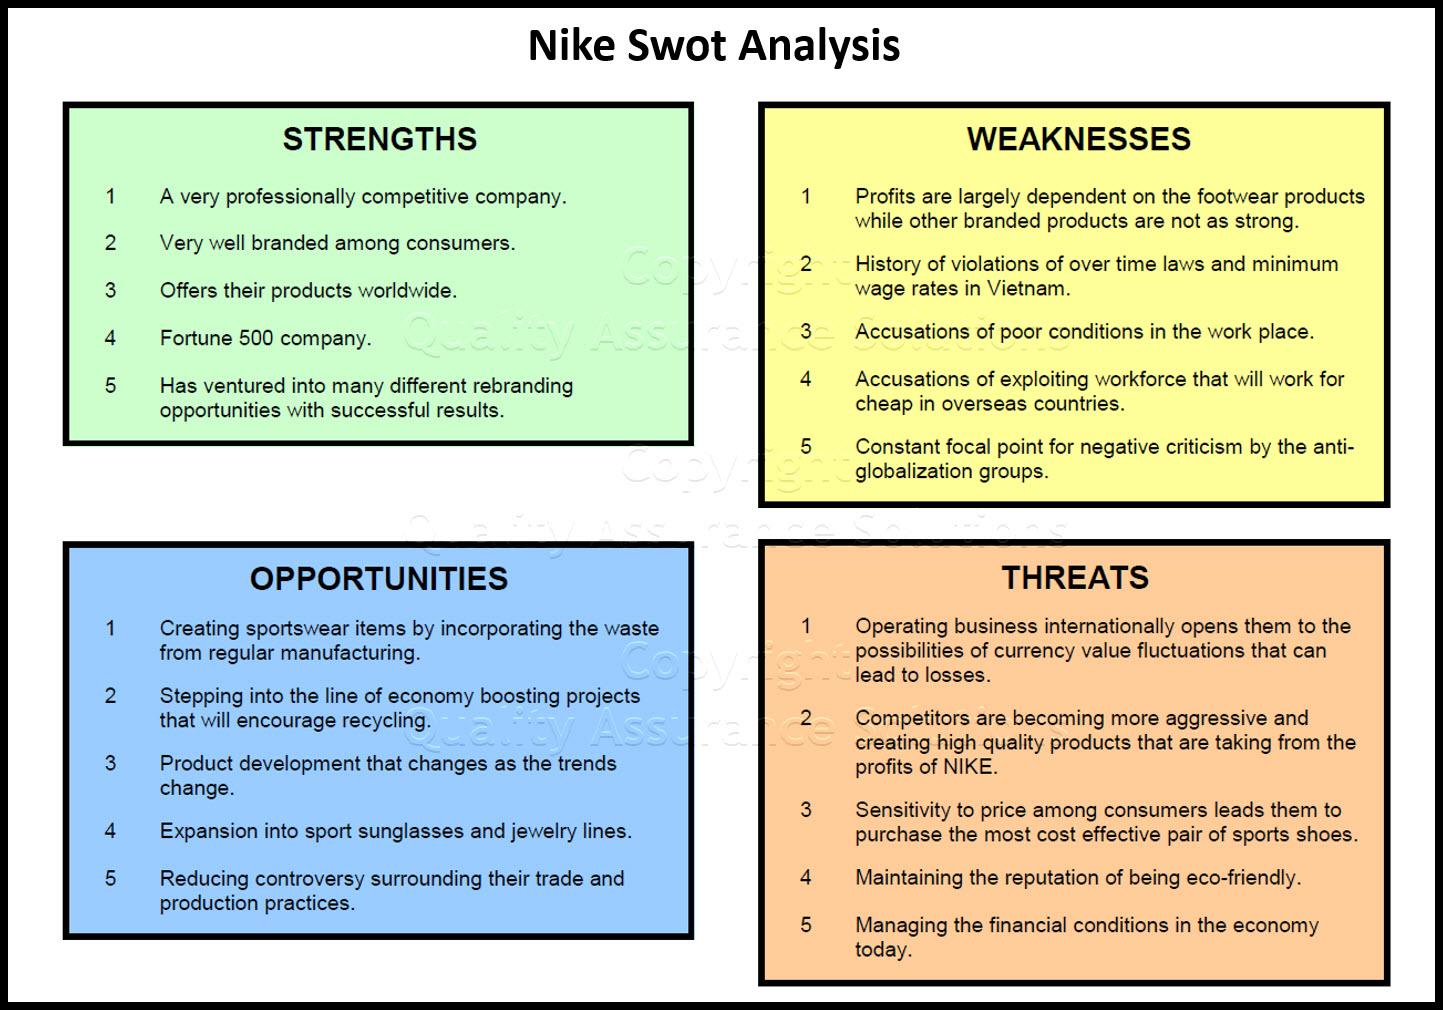 swot analysis nike business slide